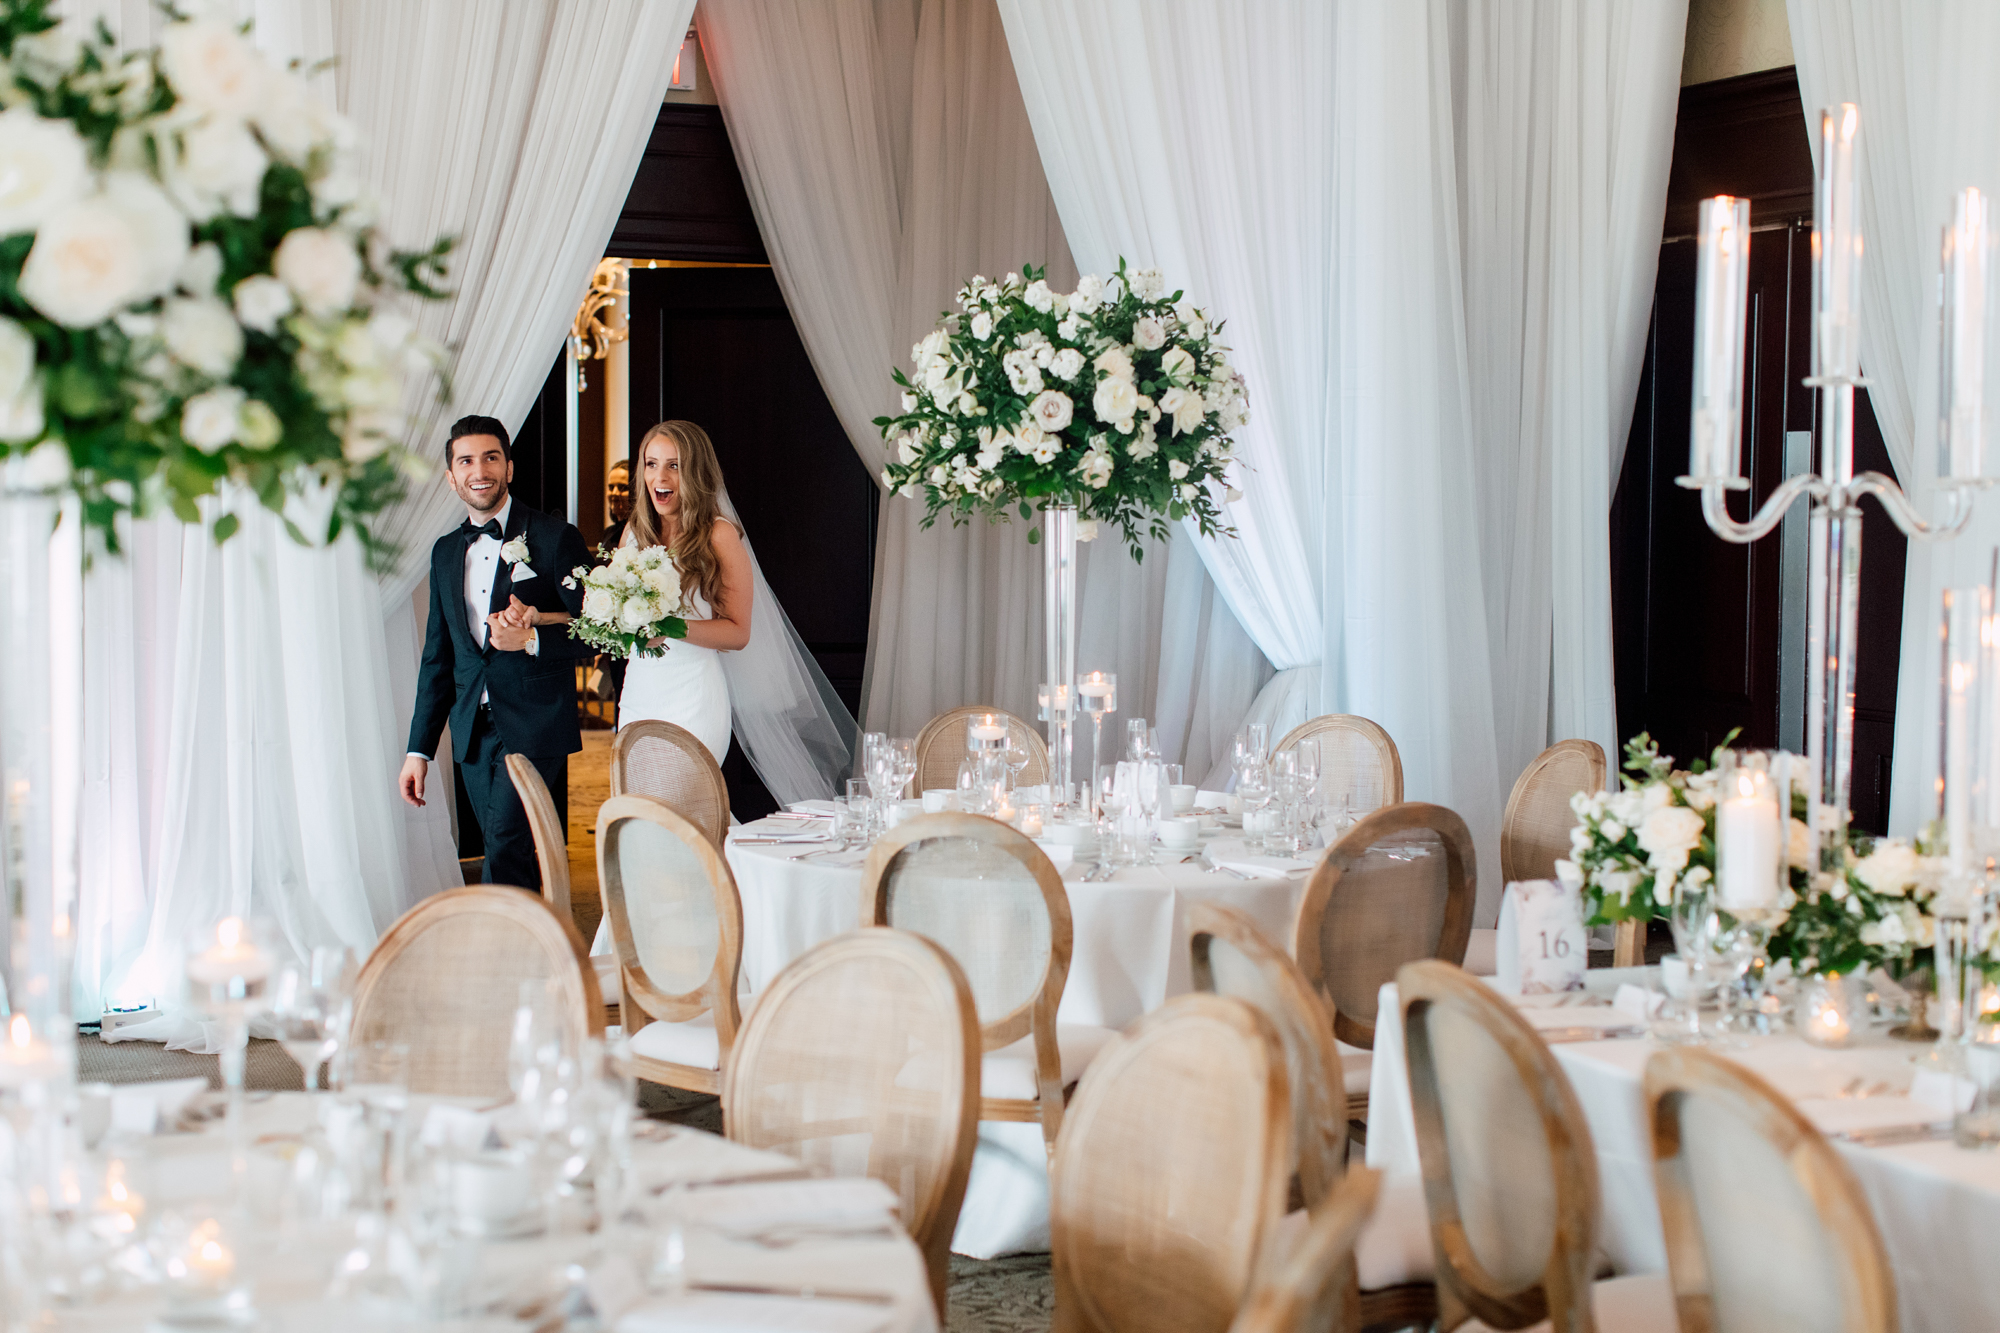 shealyn angus wedding reveal